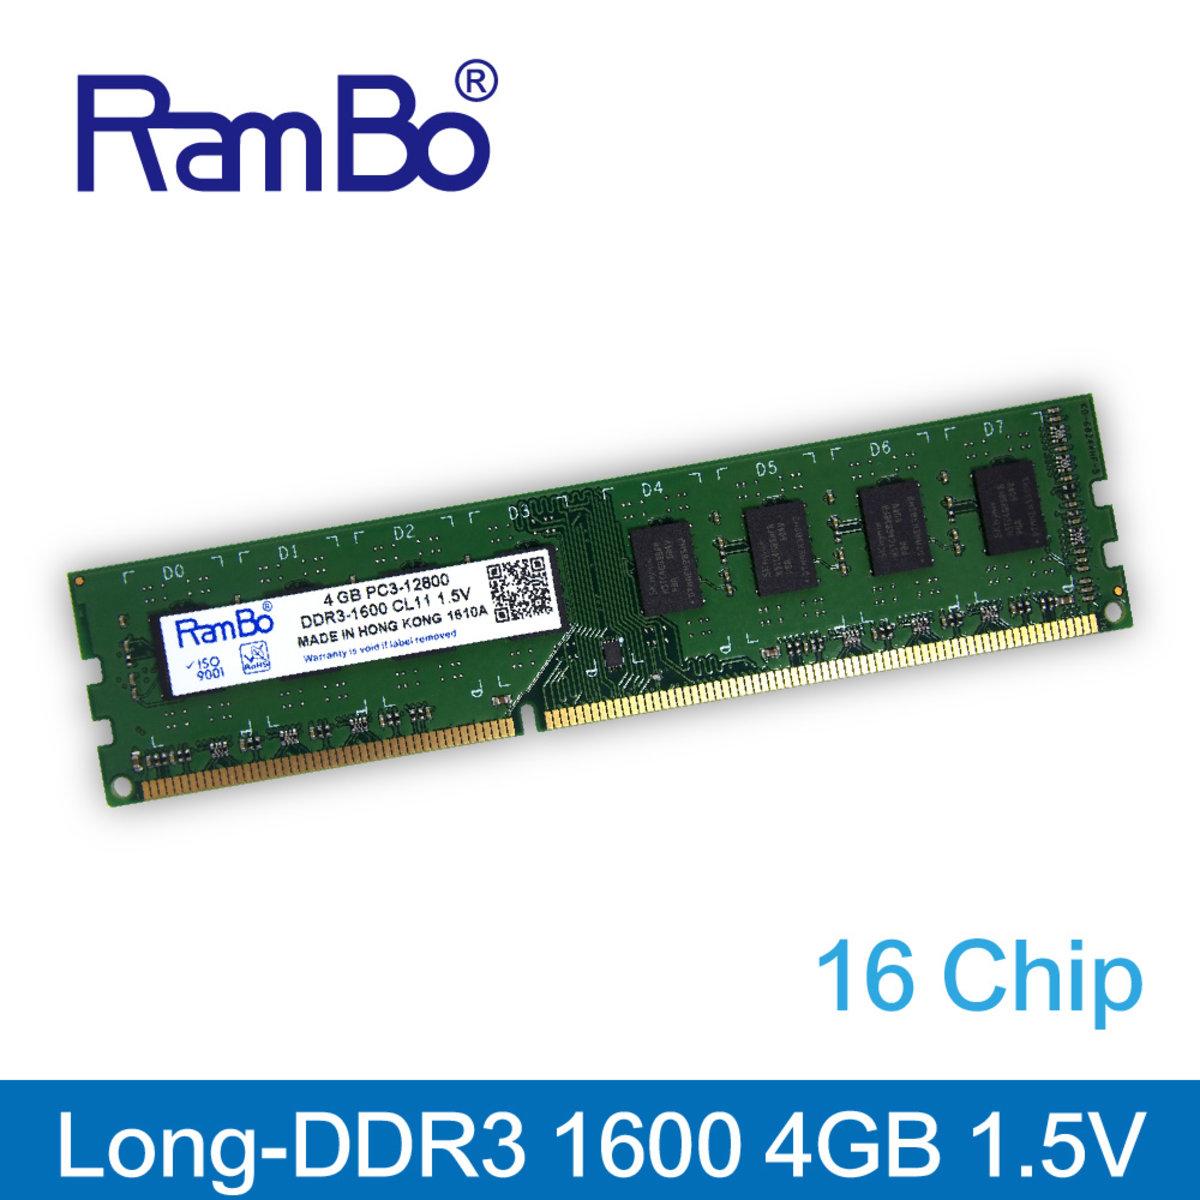 8GB DDR3 1600MHz Long DIMM 16-Chip 1.35-1.5V Memory for PC Desktop